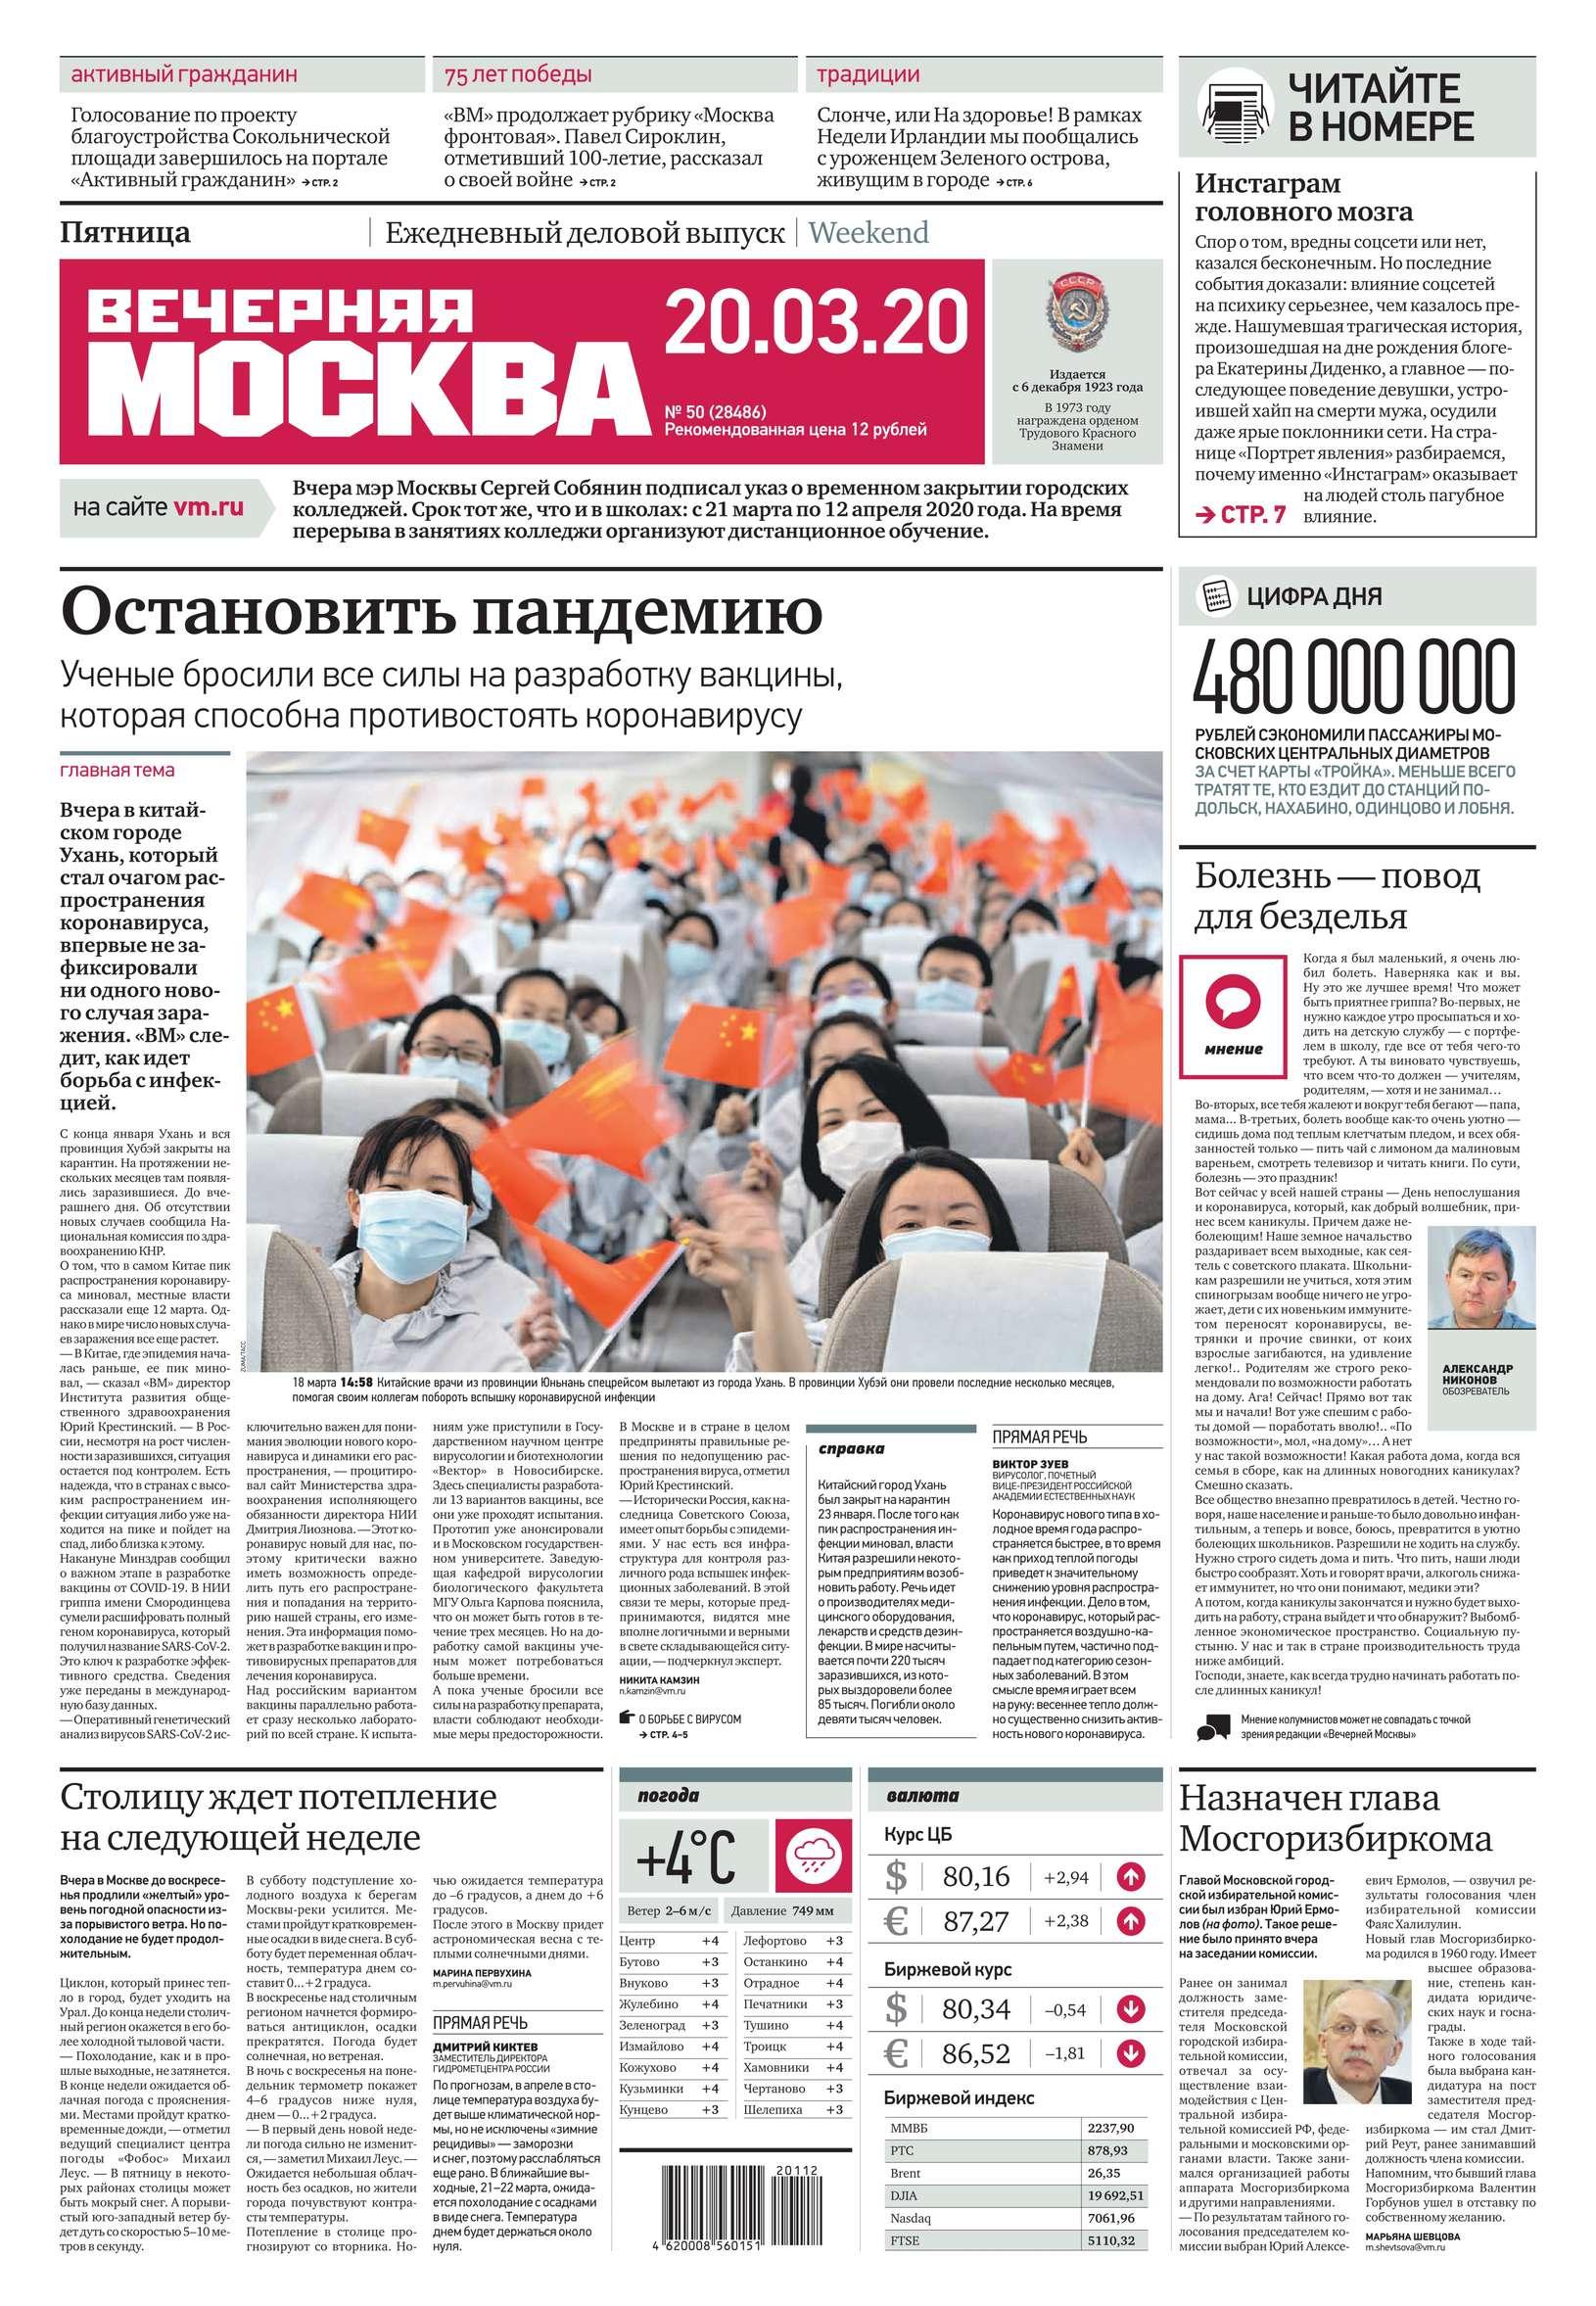 Редакция газеты Вечерняя Москва Вечерняя Москва 50-2020